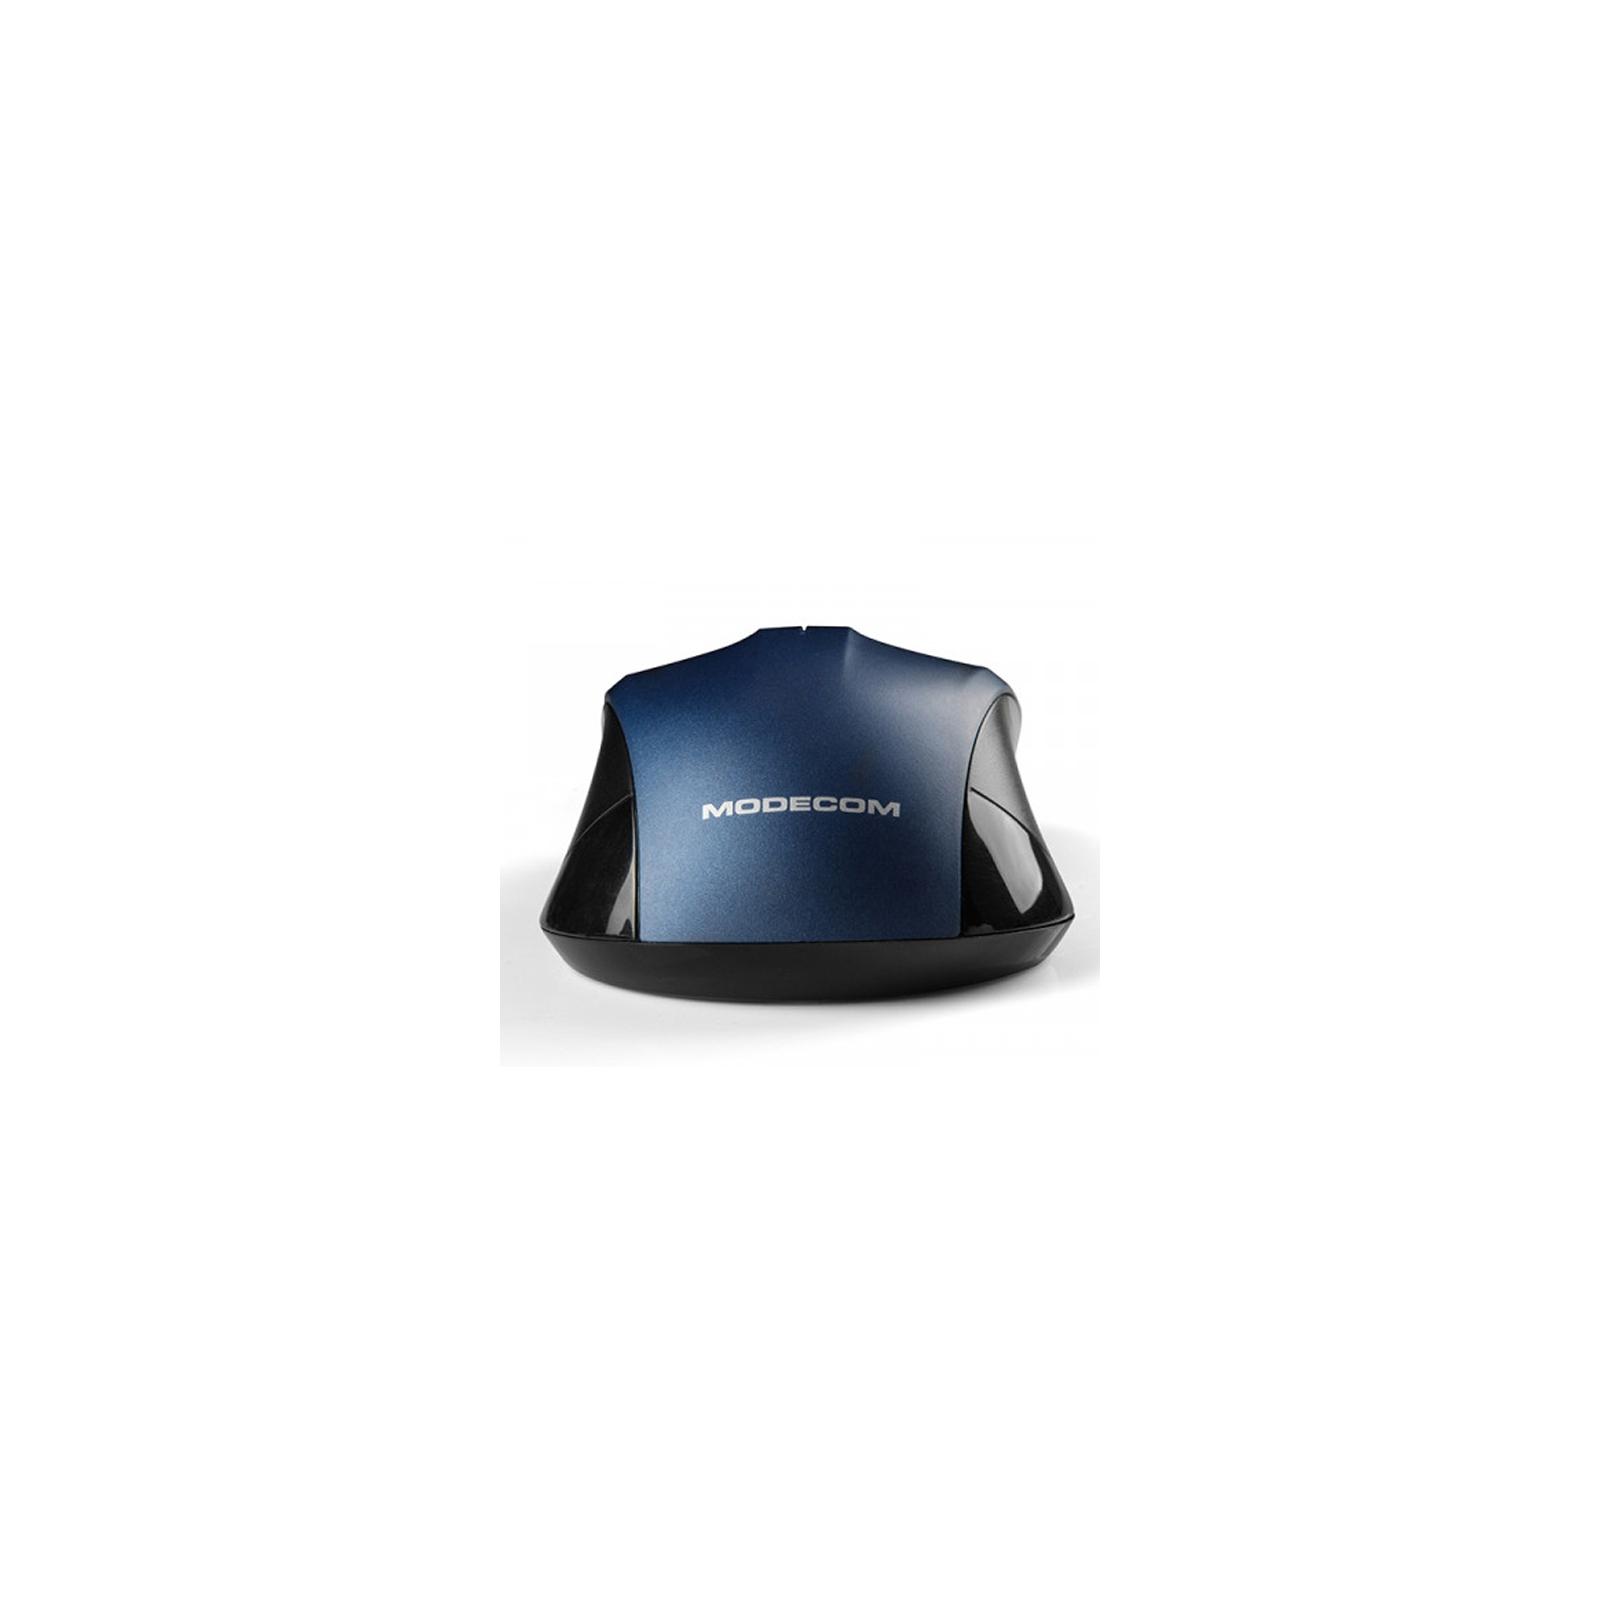 Мышка Modecom MC-M9.1 Wireless Black (M-MC-0WM9.1-100) изображение 4